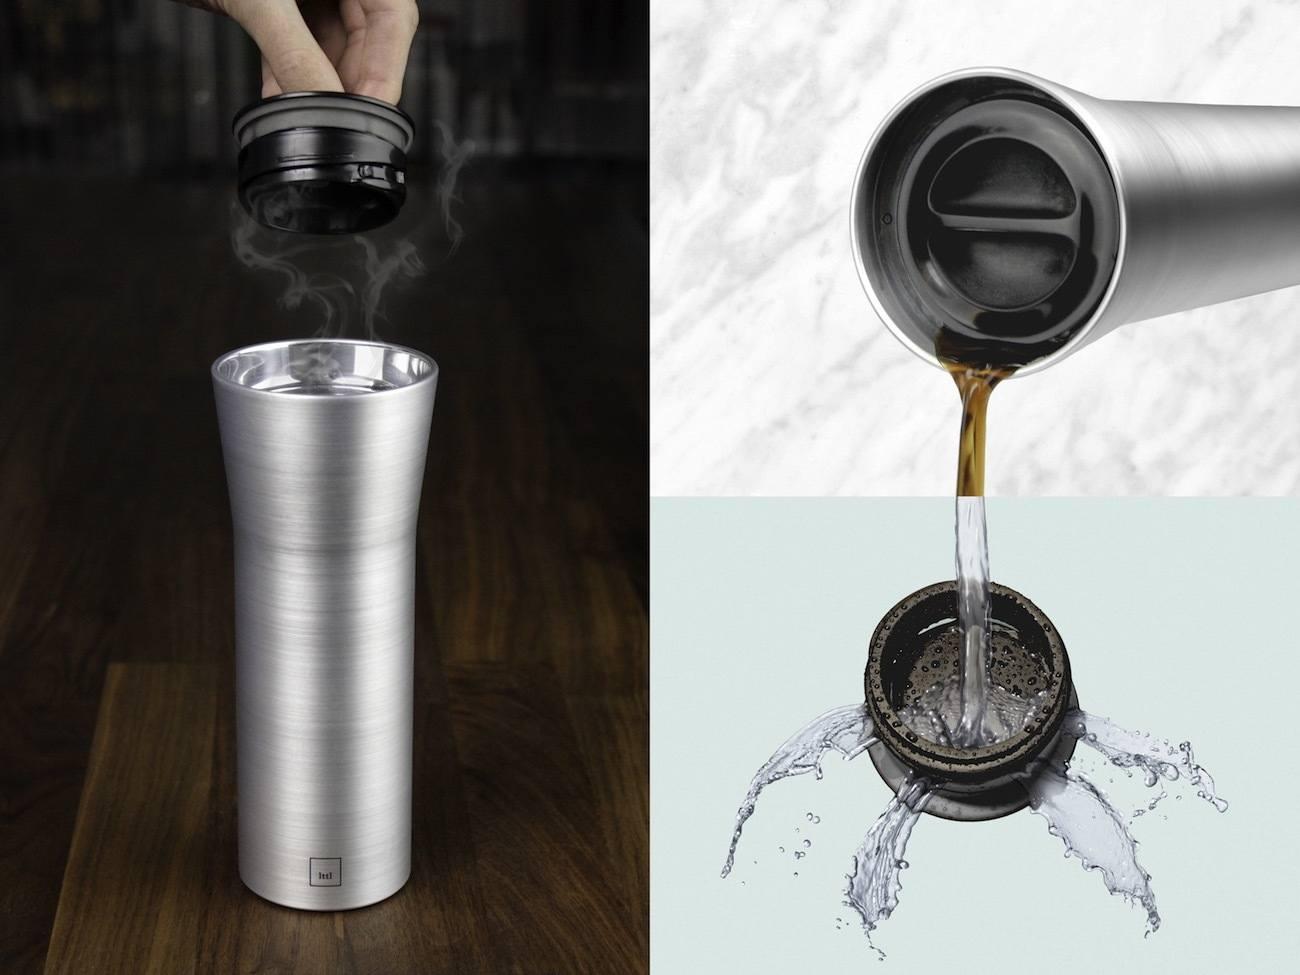 The lttl tumbler – The World's Best Insulated Travel Mug